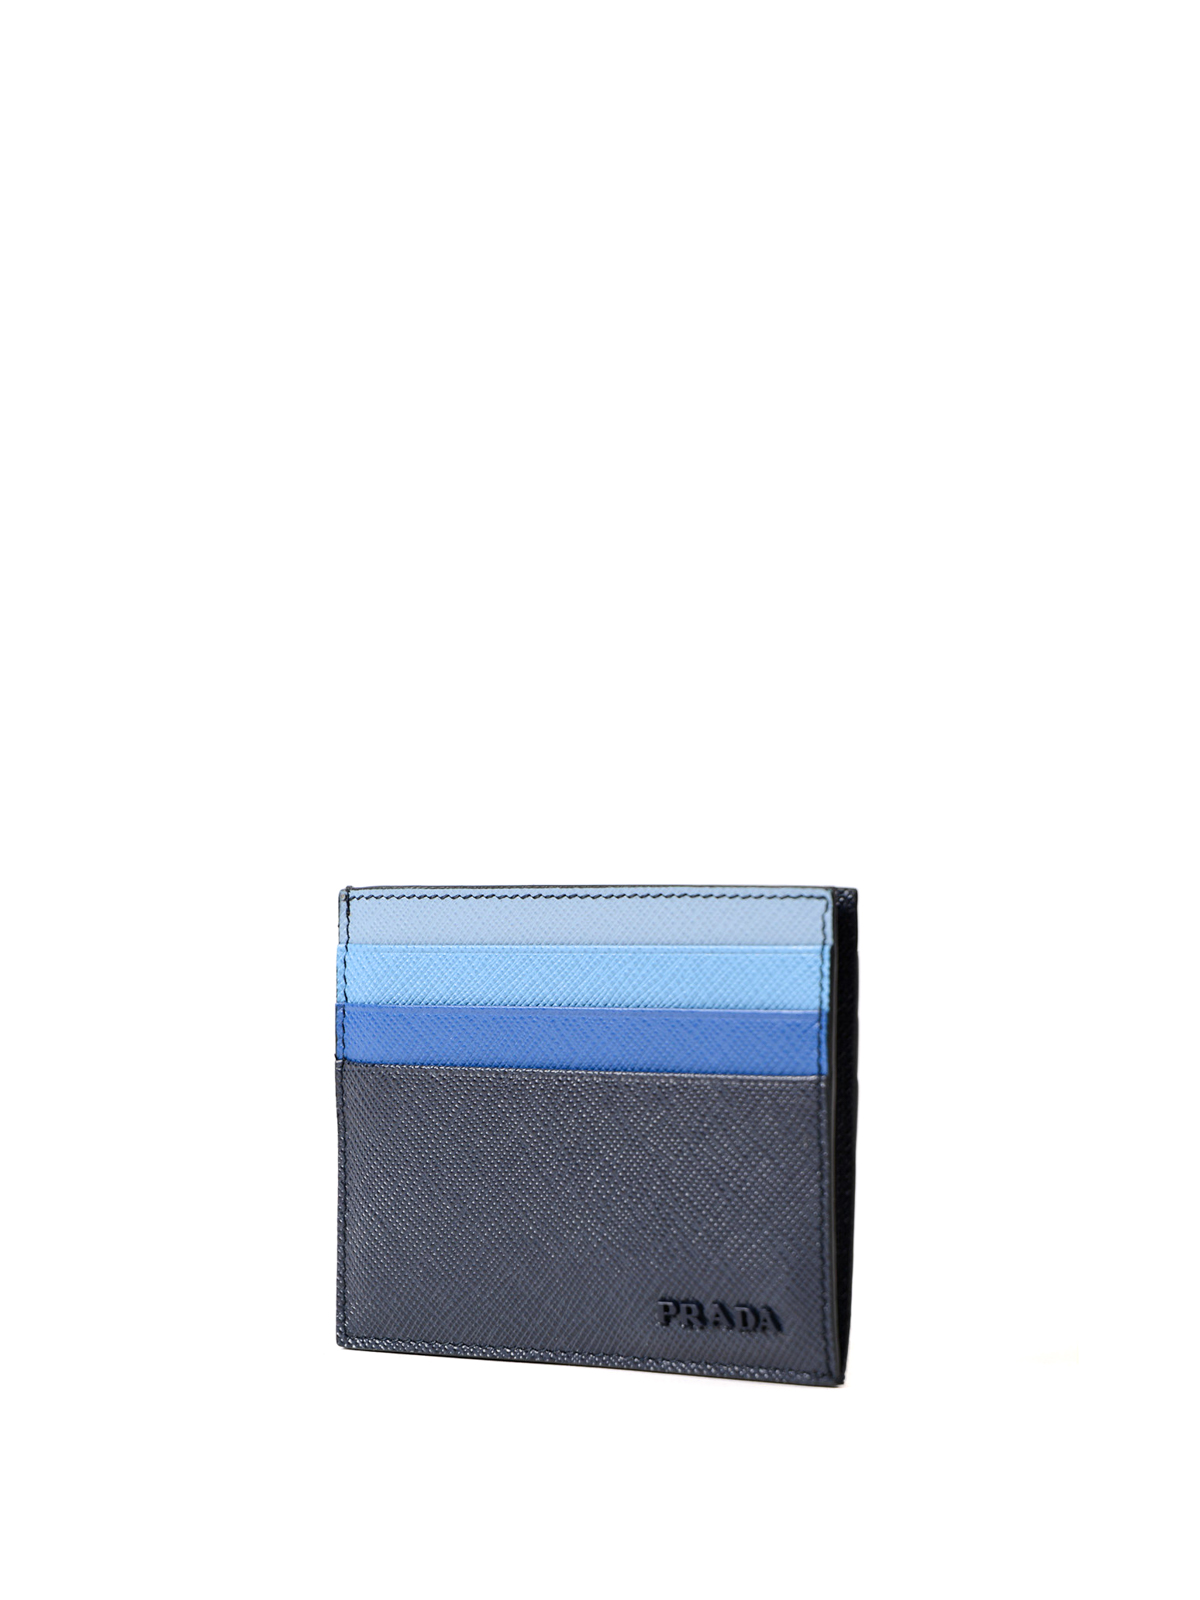 a3773dea18d2 PRADA: wallets & purses online - Fading blue saffiano card holder